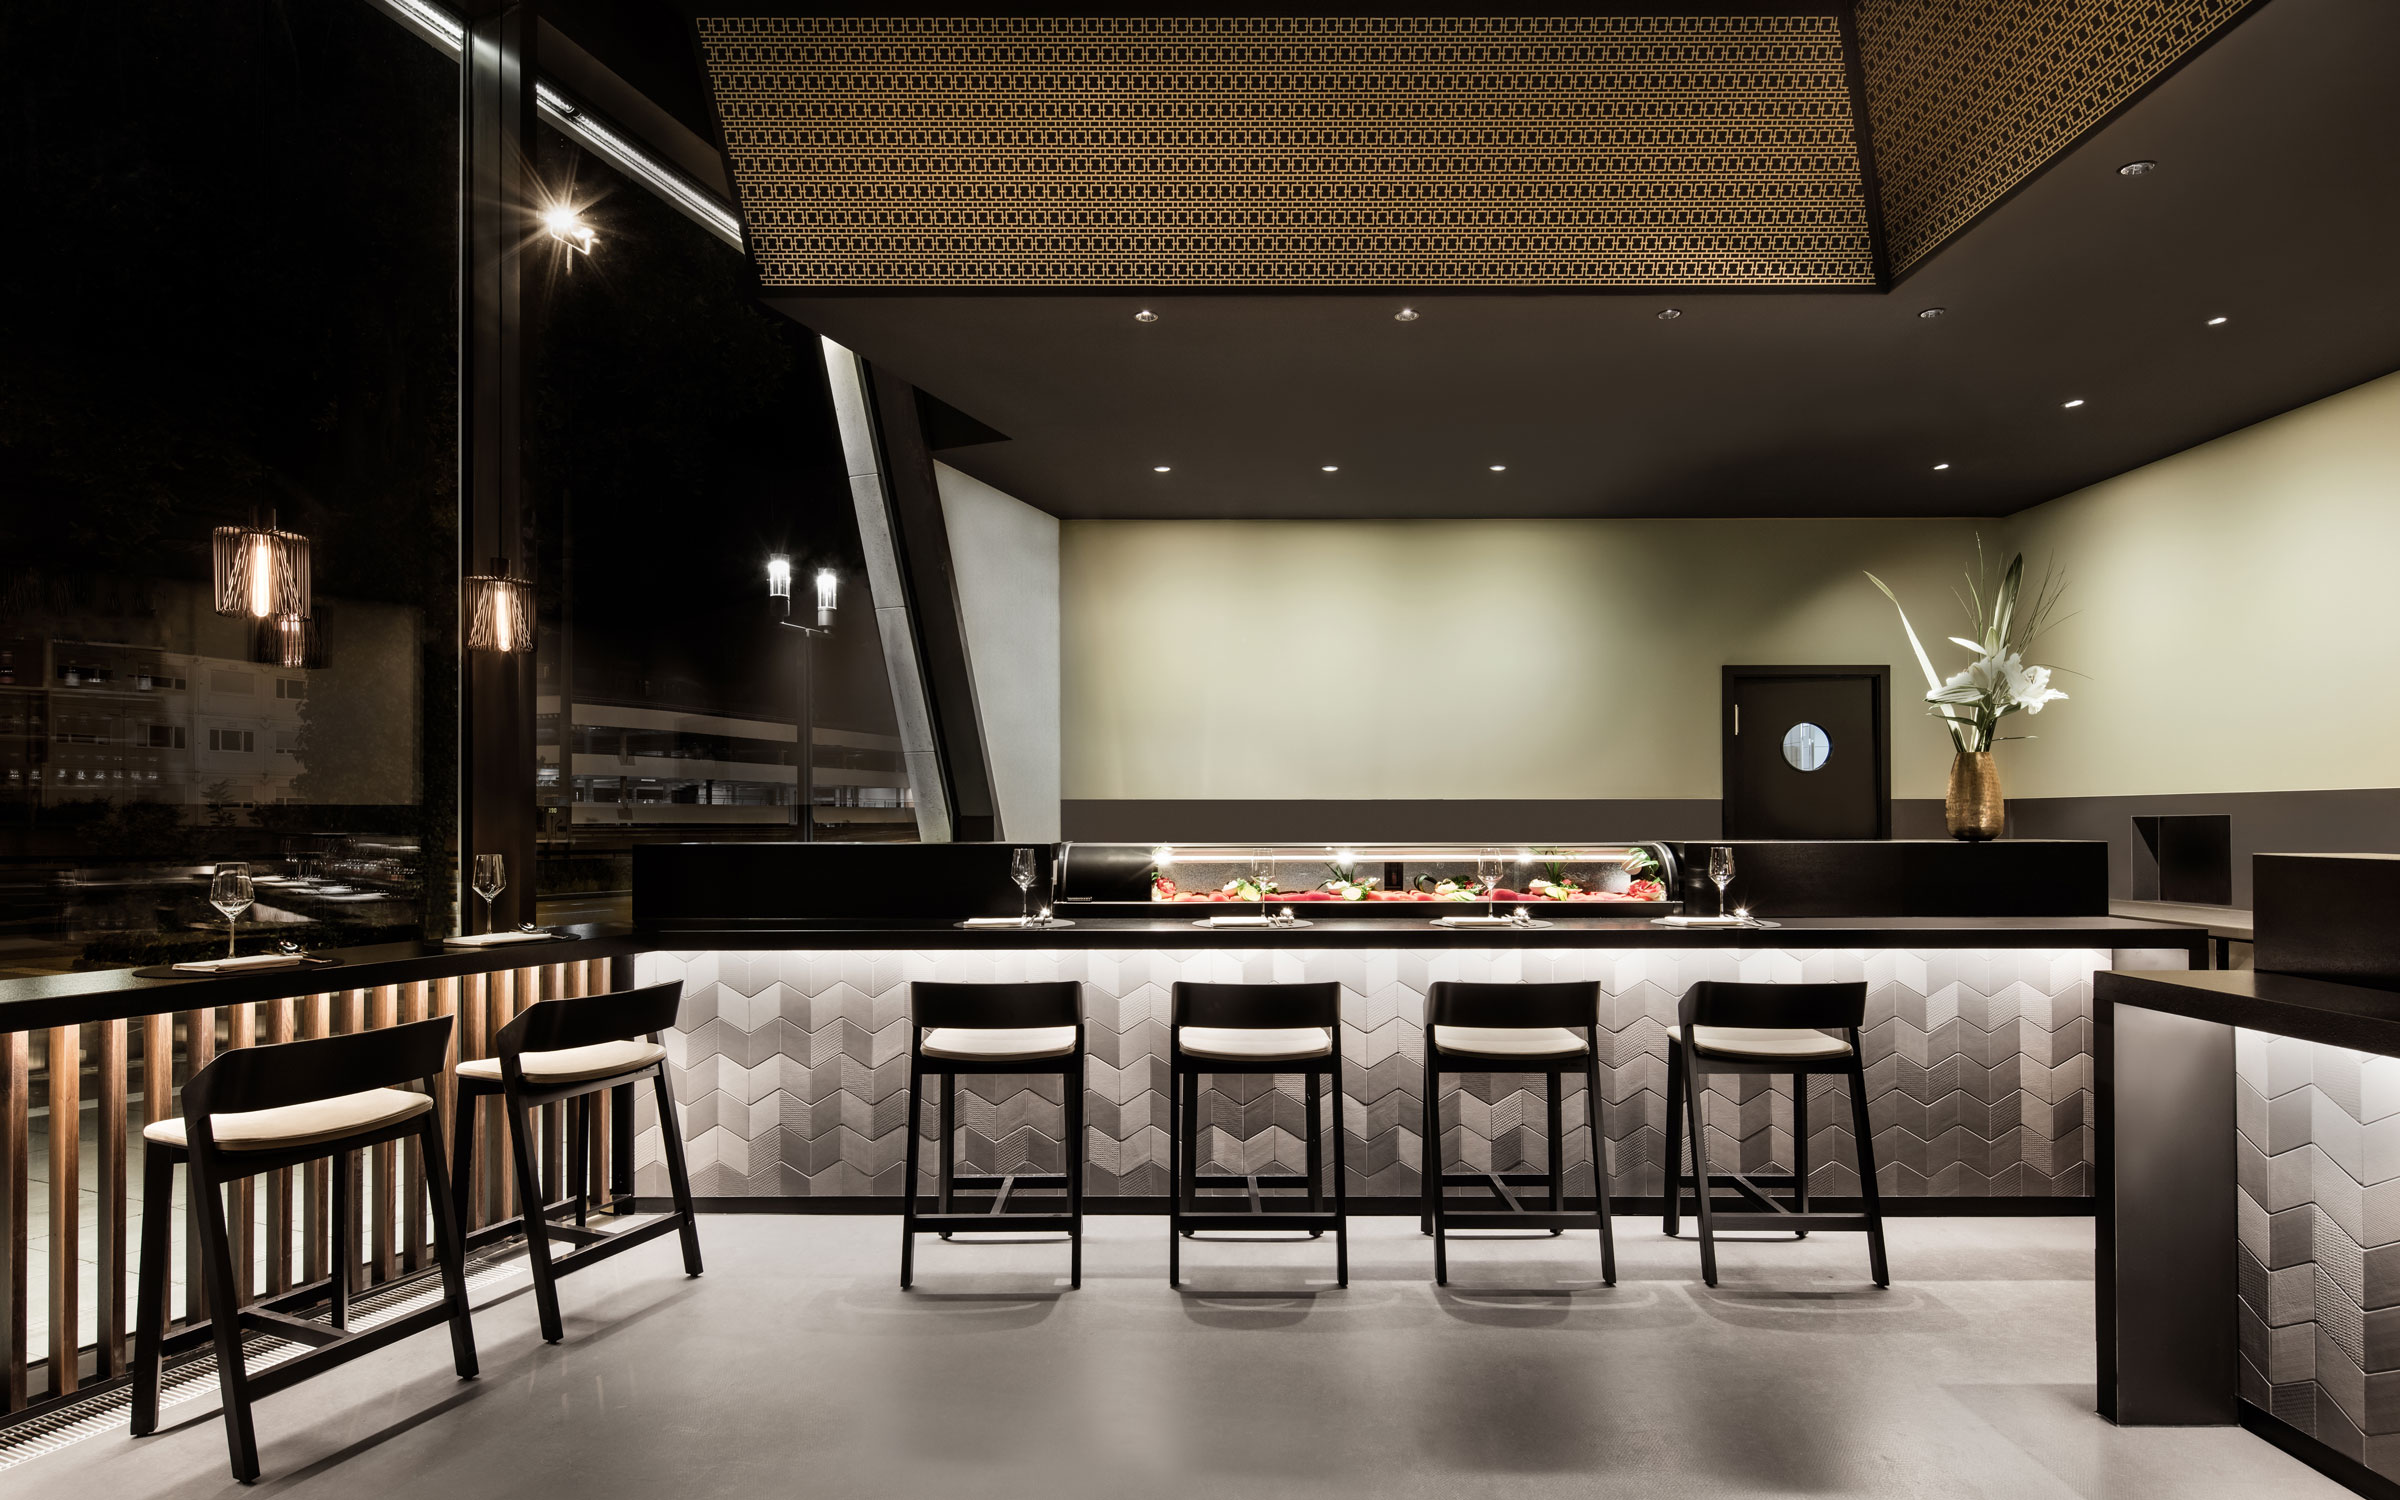 Enso Sushi & Grill, Bar, Theke